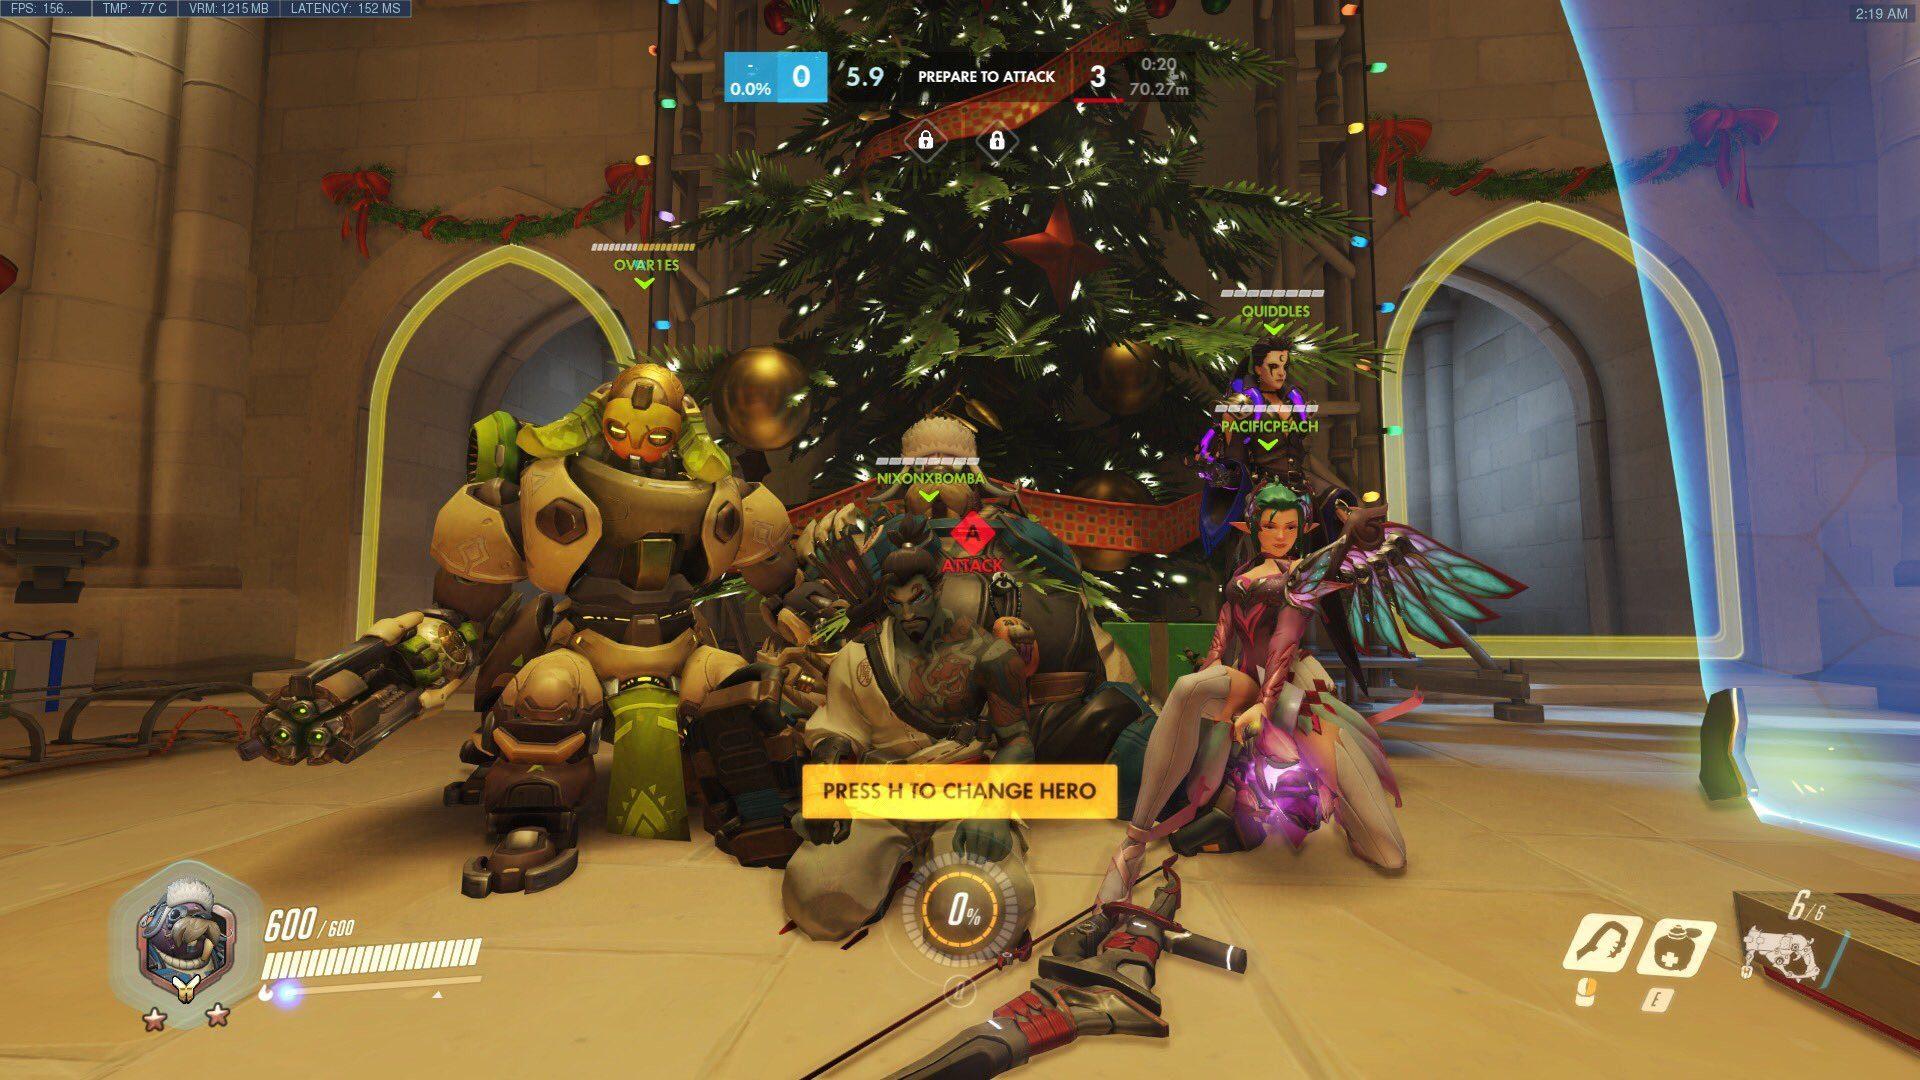 A festive celebration in Overwatch